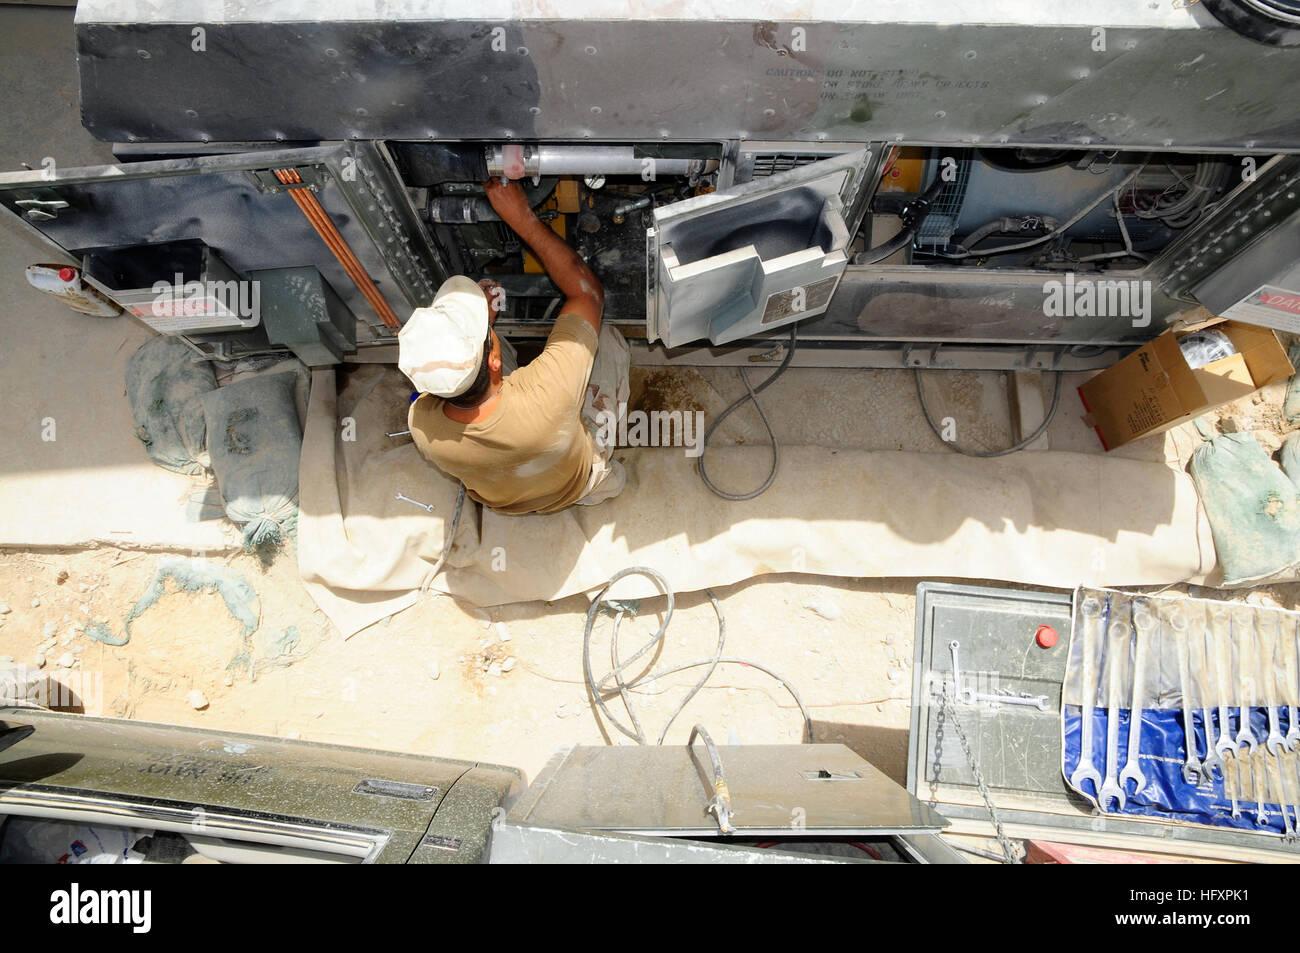 090819-N-9584H-020 KANDAHAR, Afghanistan (Aug. 19, 2009) Construction Mechanic 1st Class Gabriel Rivera, assigned - Stock Image